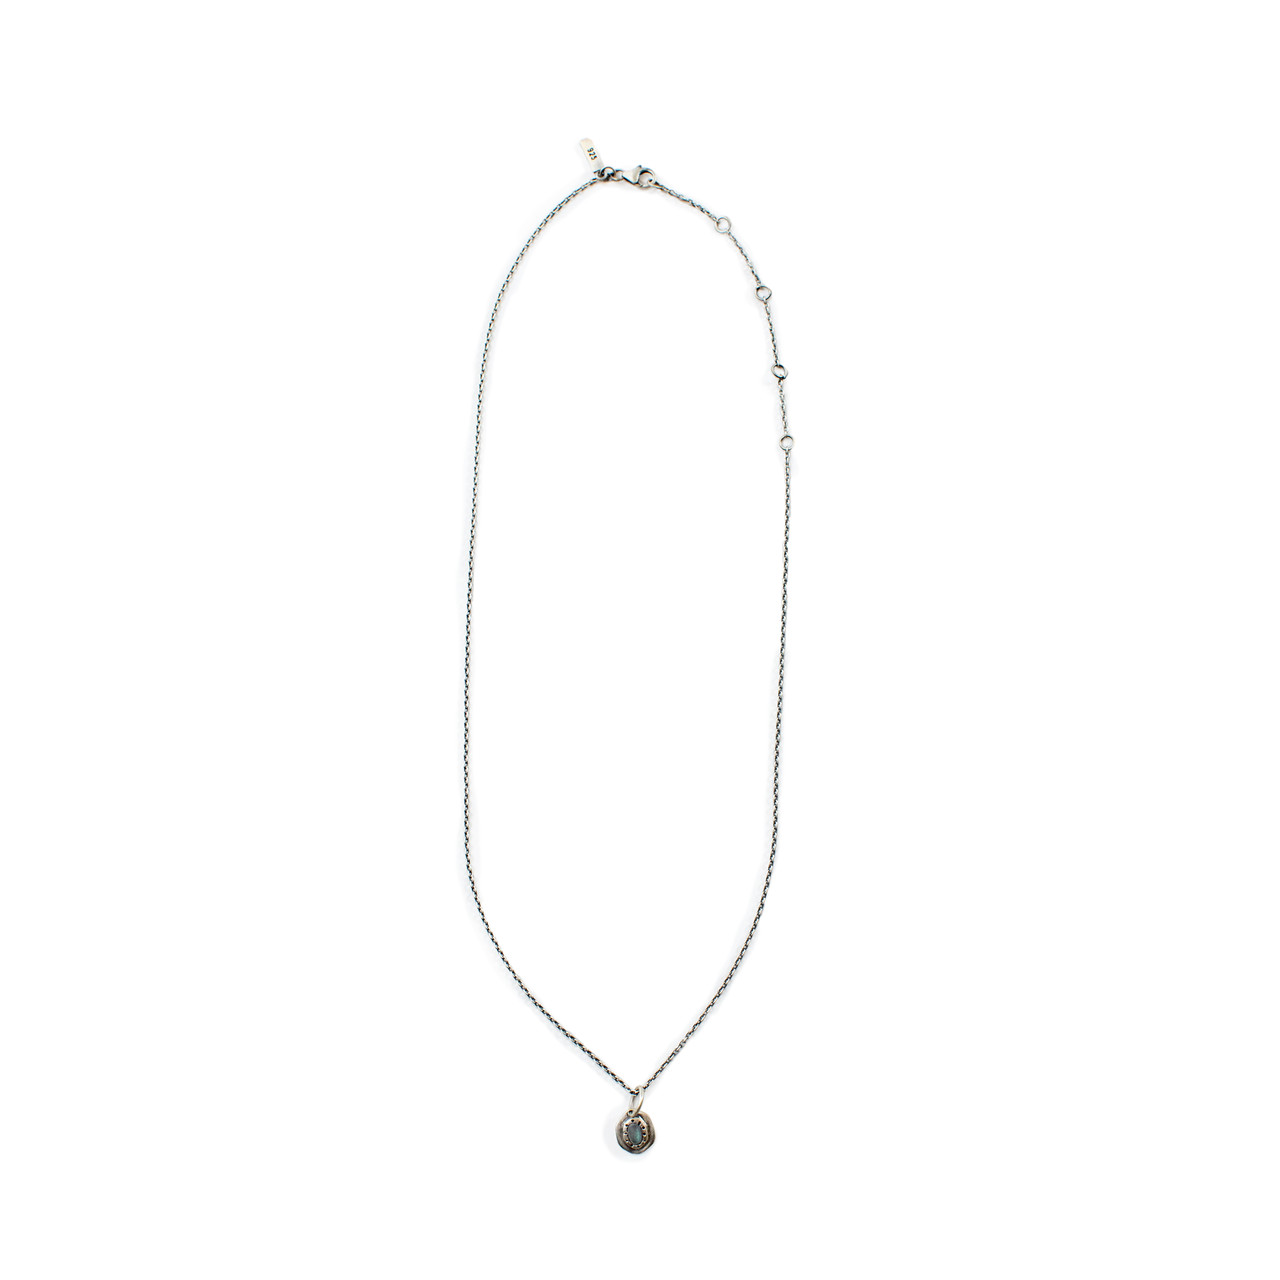 Oxidized Small Pendant Necklace